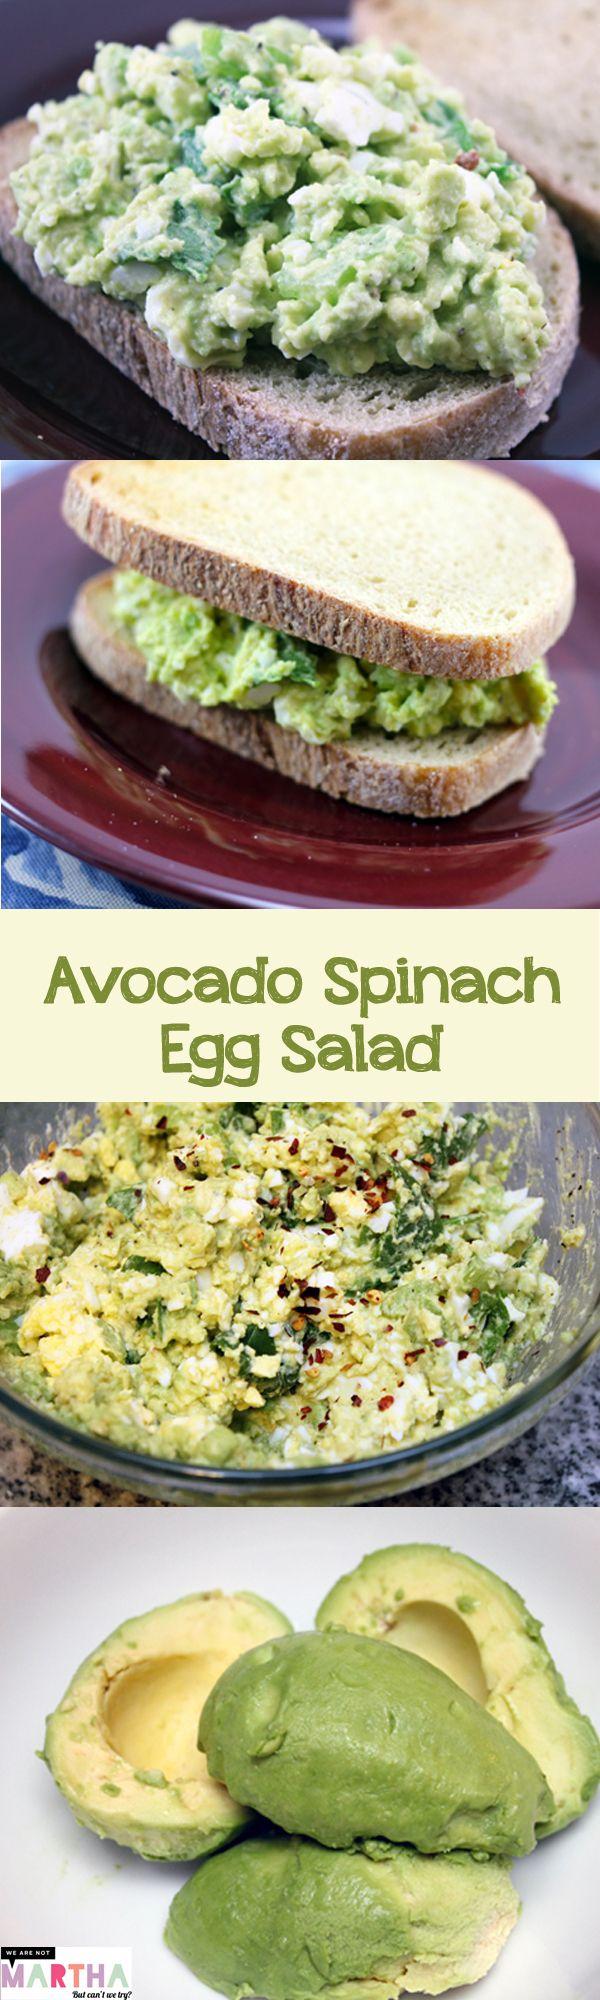 Avocado Egg Salad with Spinach